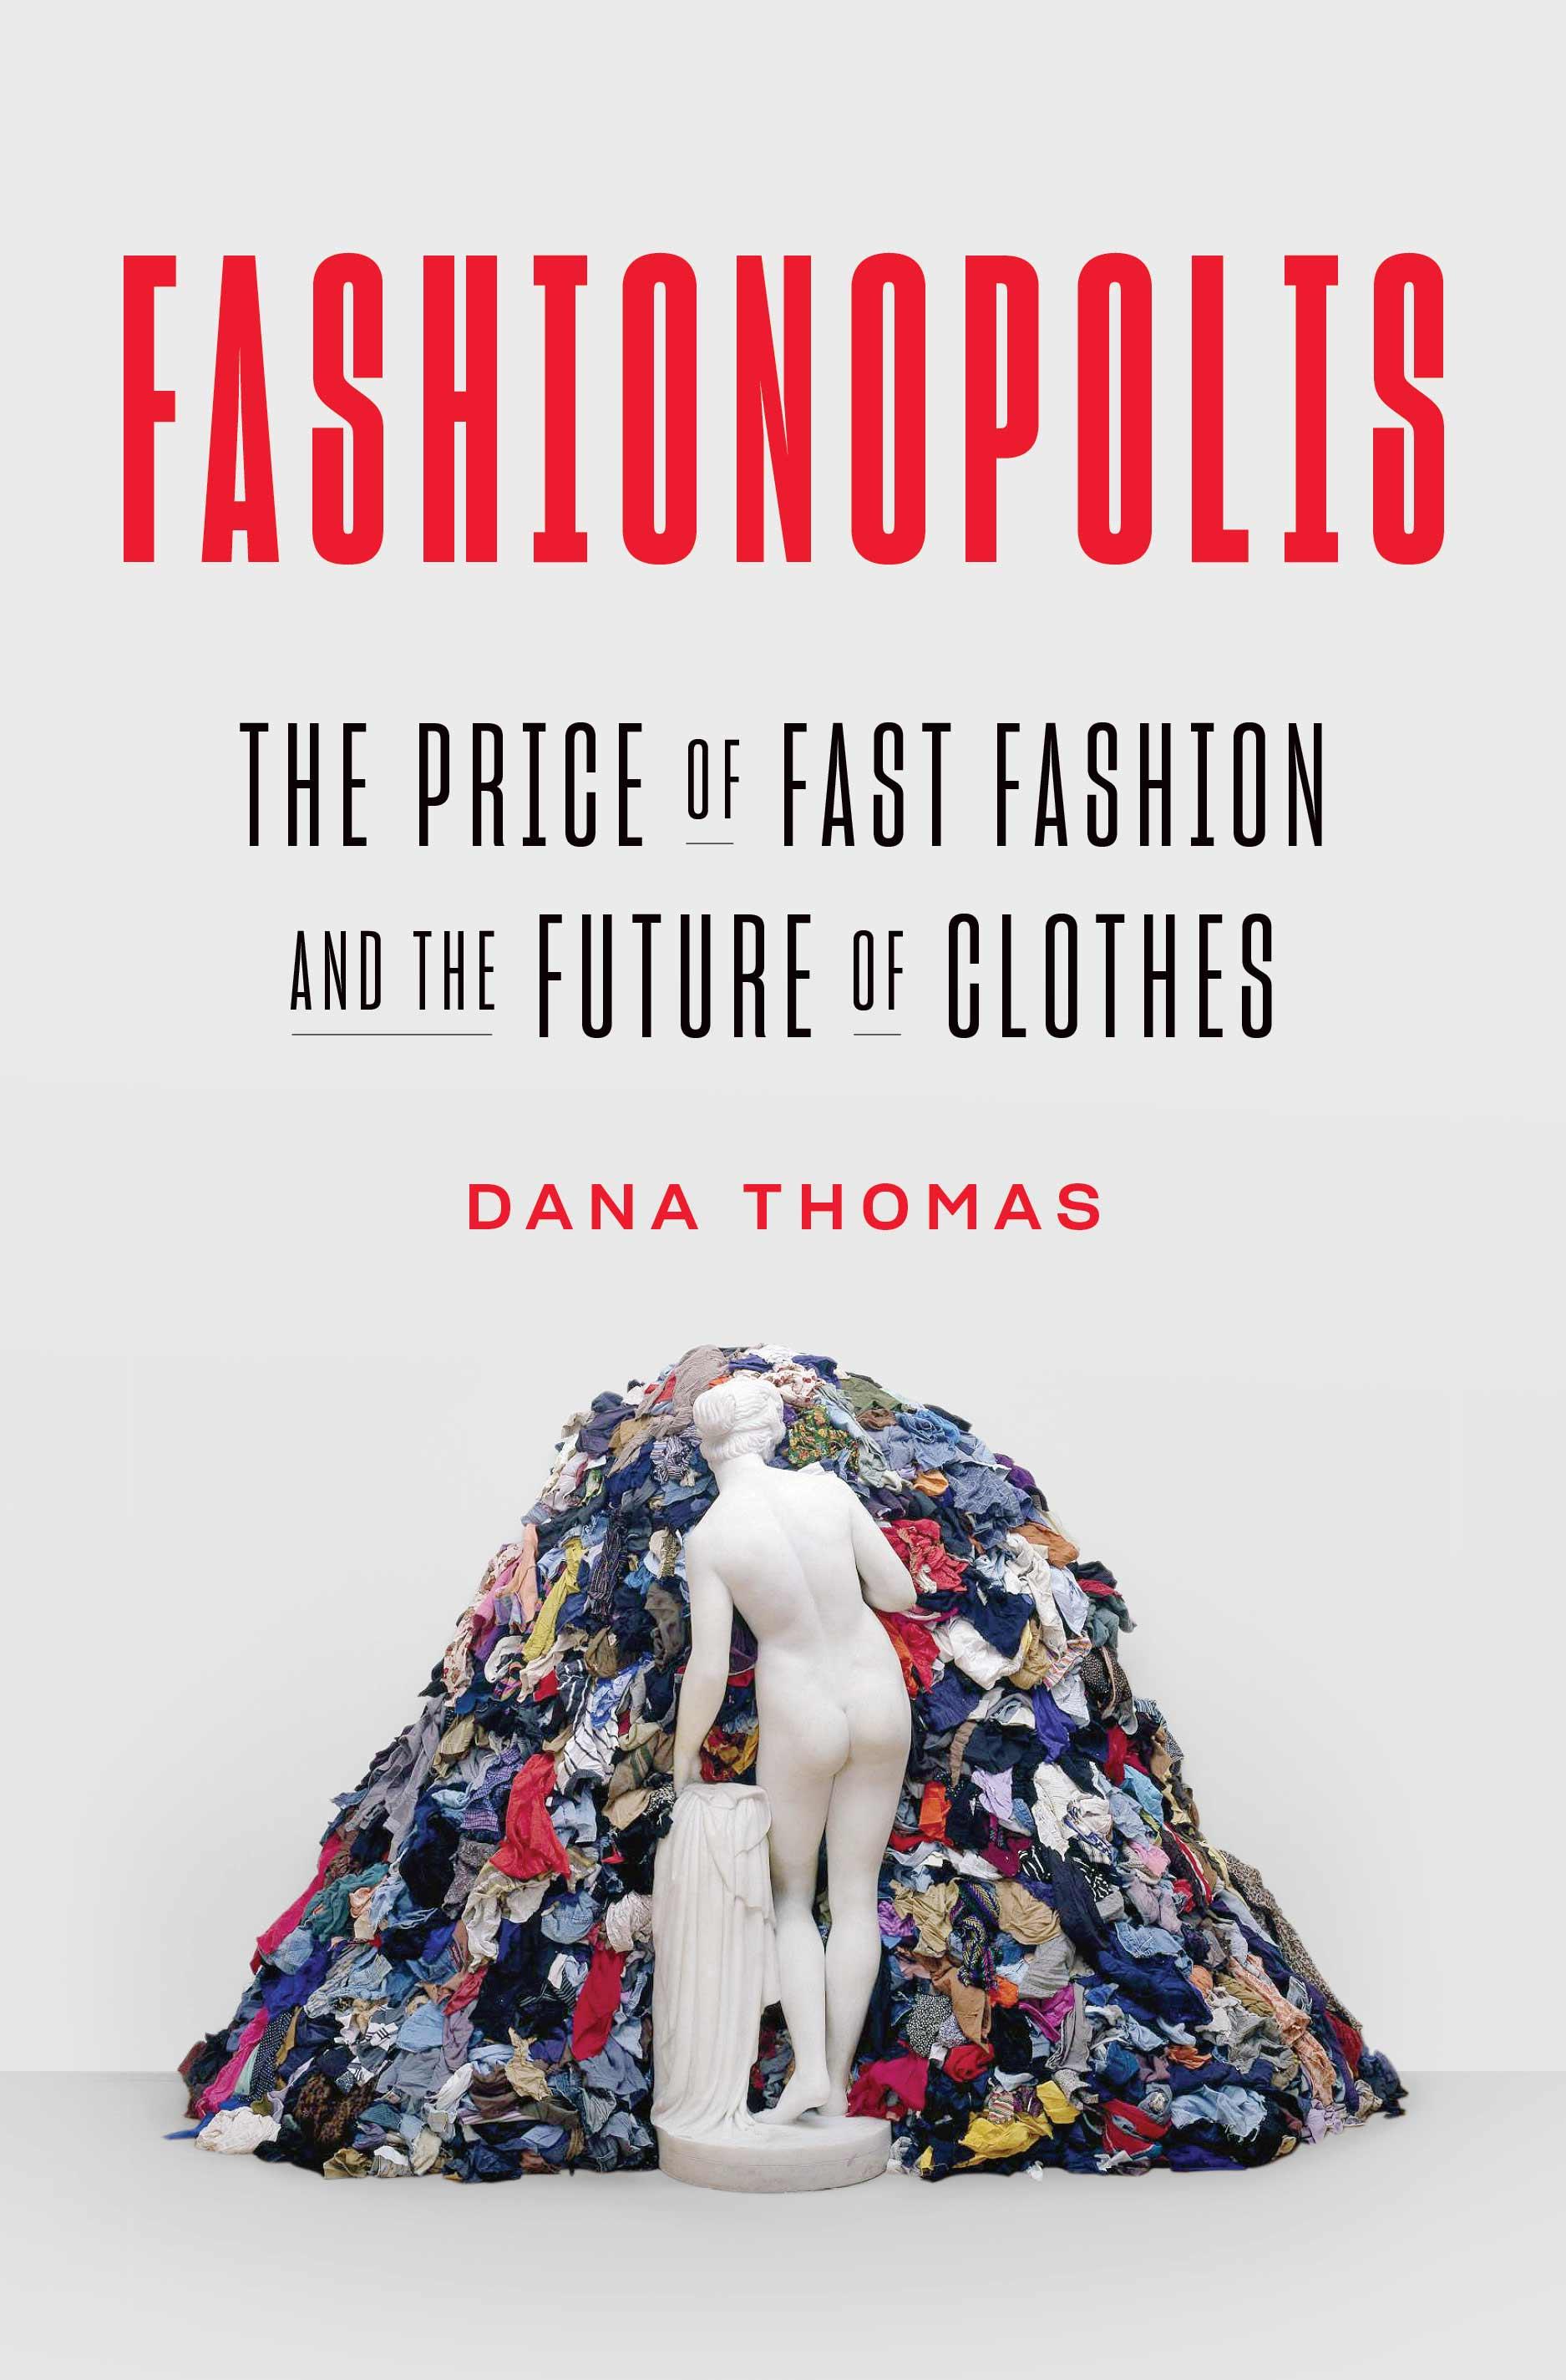 Fashionopolis-dana-thomas-cover-everpress-blog-sustainability